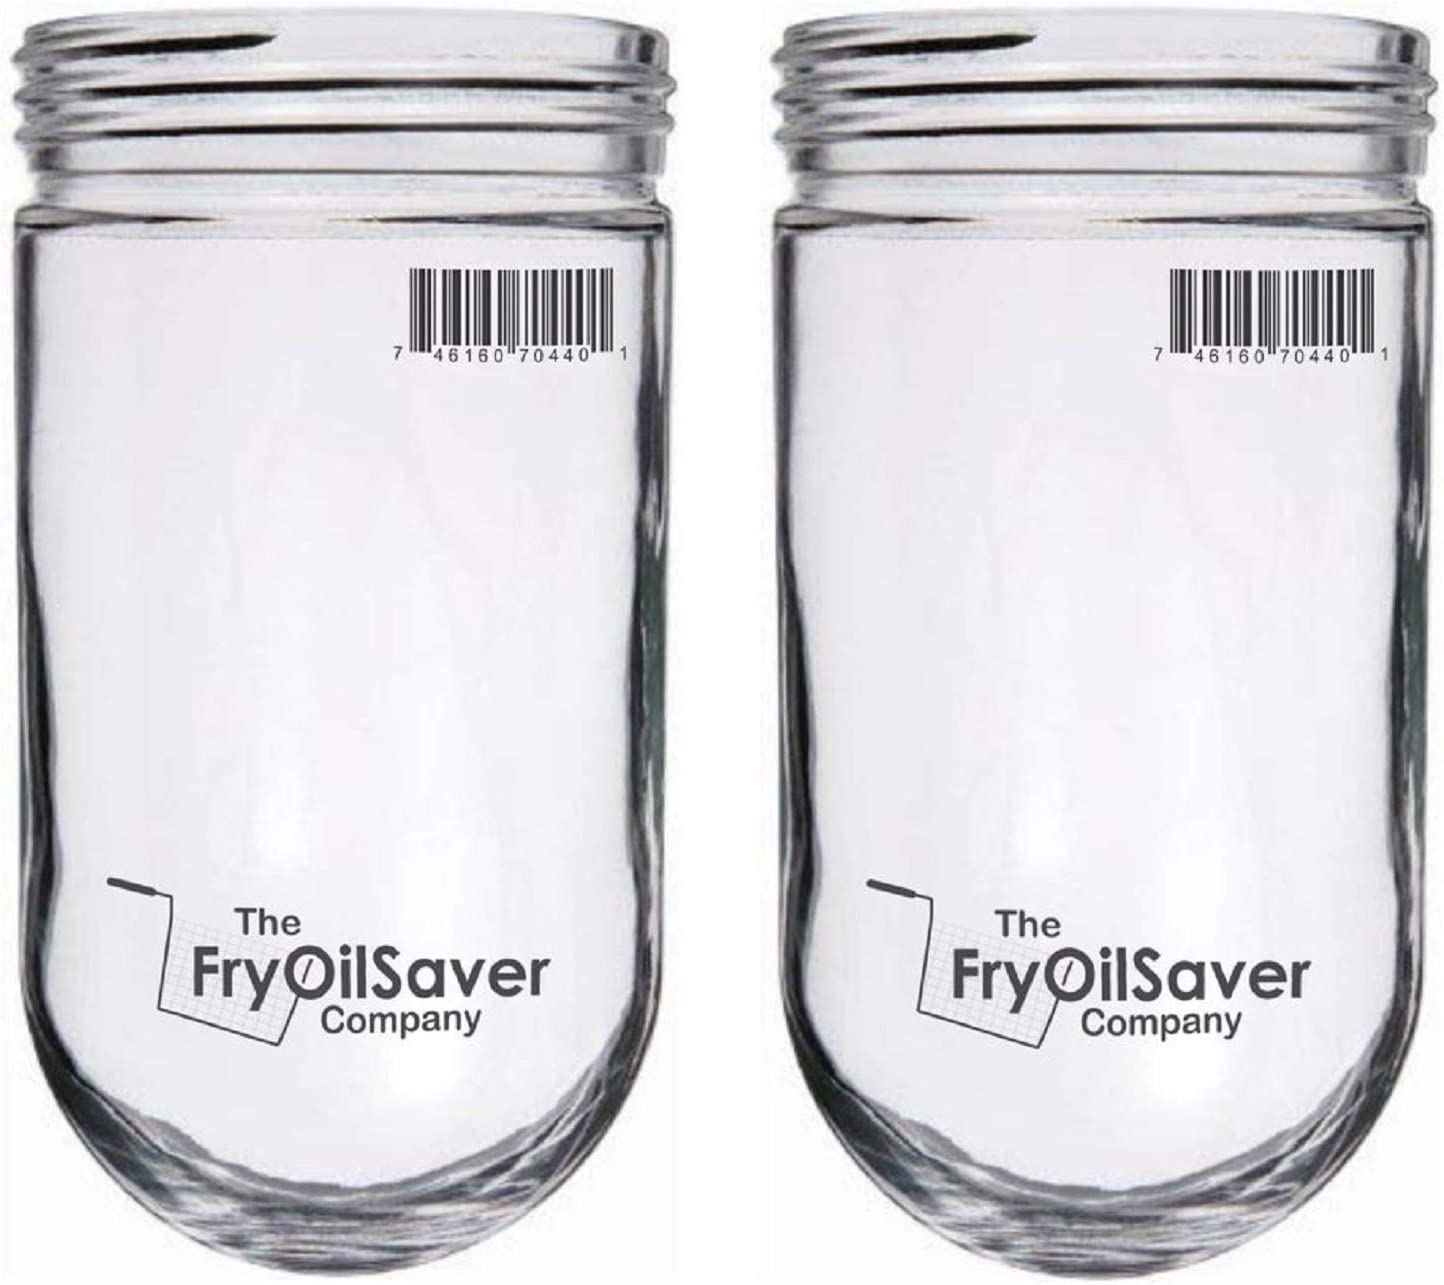 FryOilSaver, CHG L10-X006 Glass Globe Bulb Cover for Walk in Refrigerators, Light Bulb Protector Globe for Hood Bulbs, 31902, Pack of 2